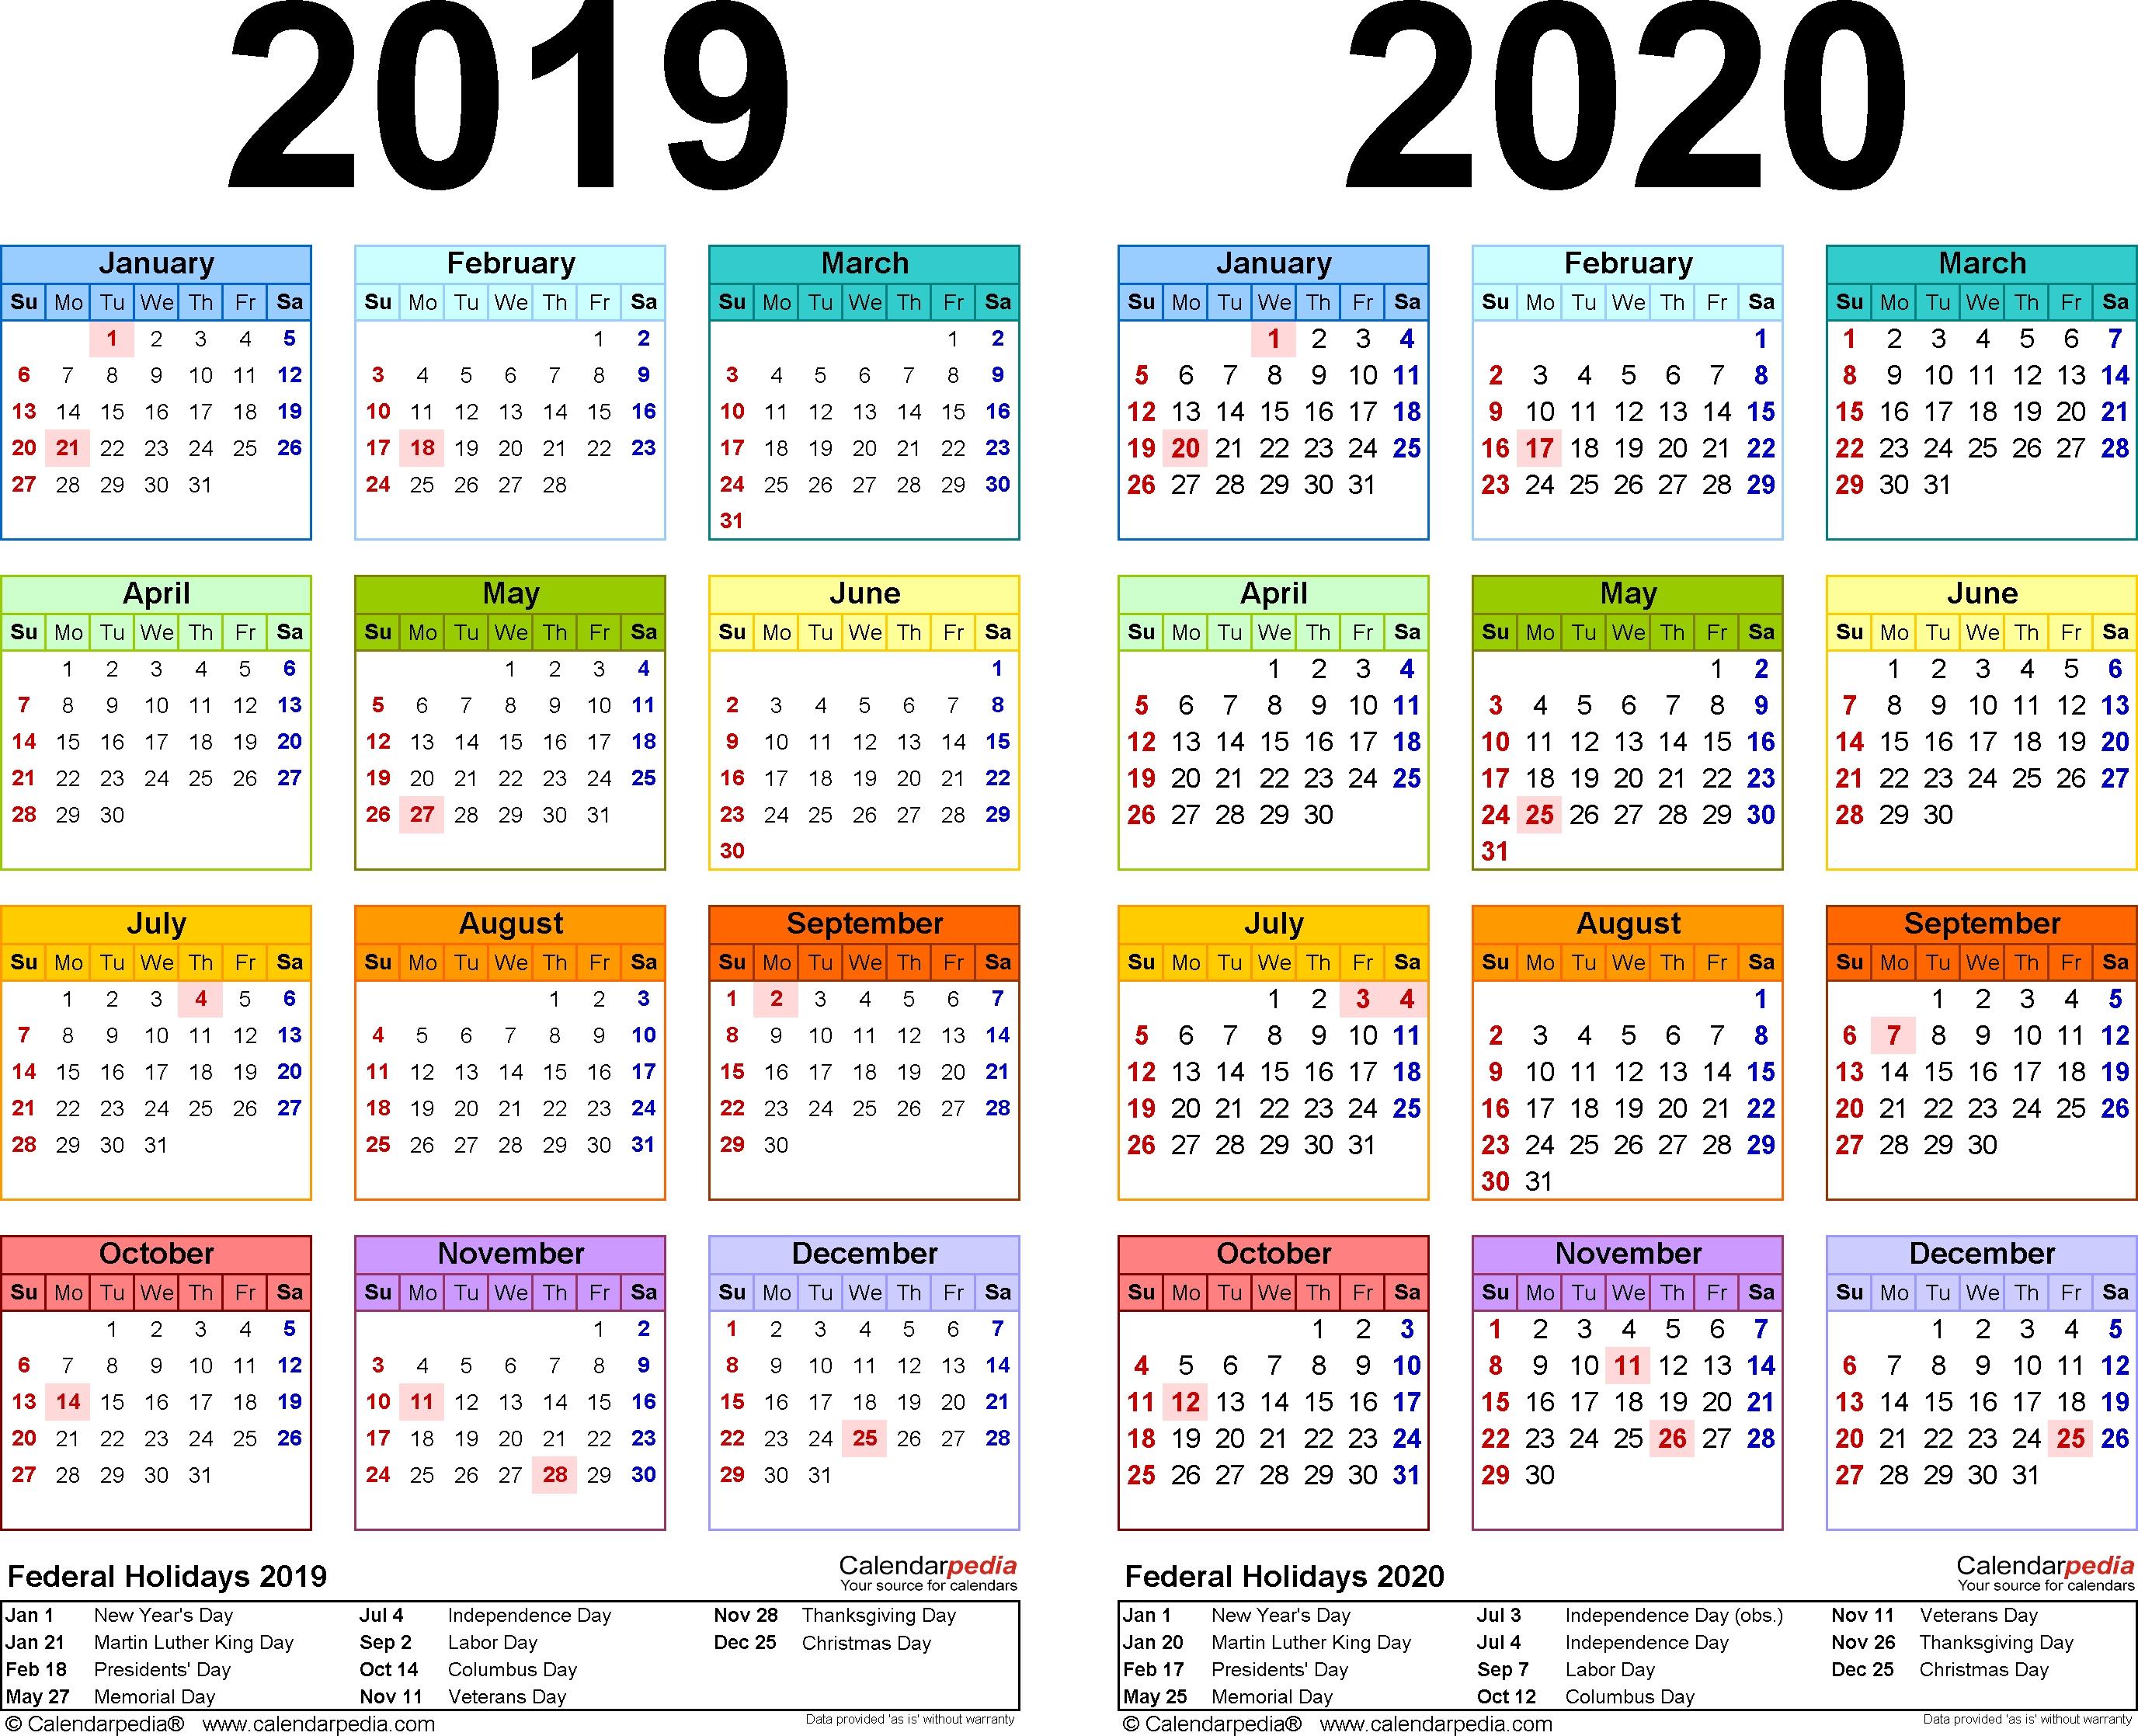 2019 2020 School Year Calendar With Holiday Us - Google Malaysia School Academic Calendar 2020